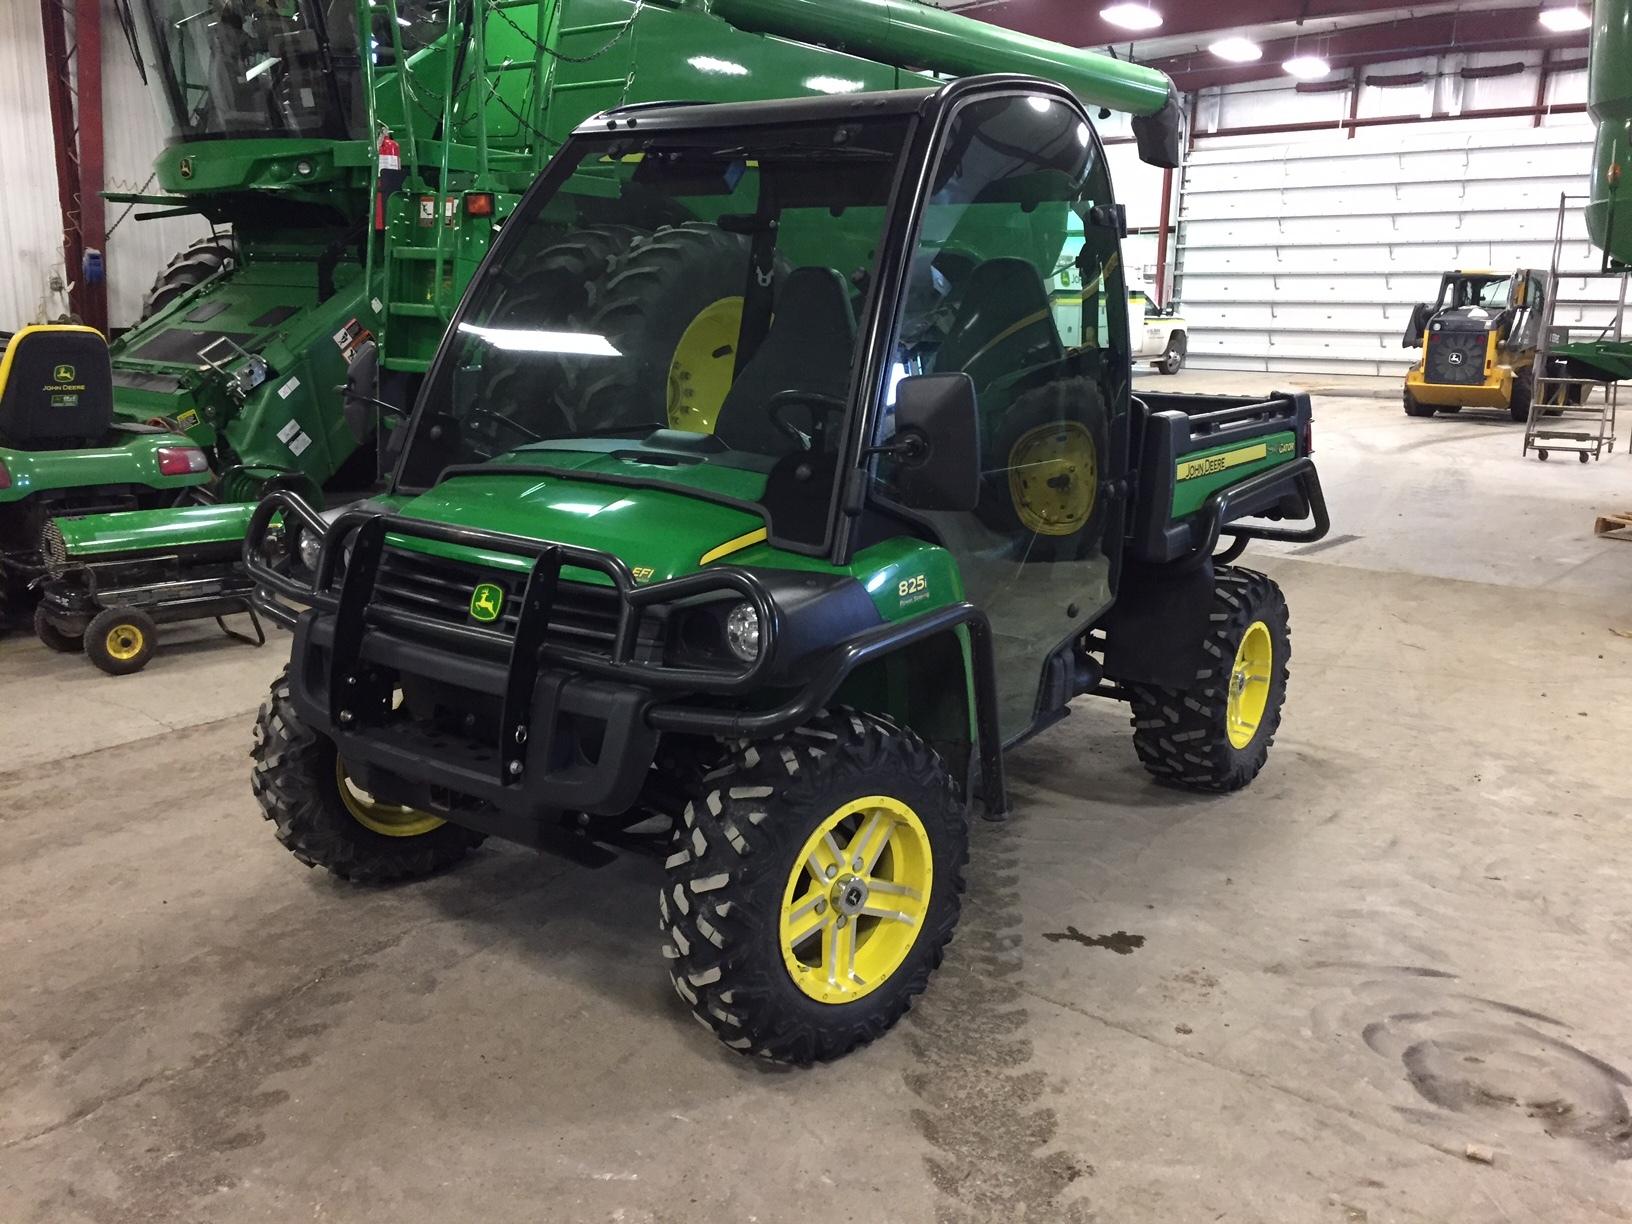 John Deere Gators >> John Deere XUV 825i Power Steering ATVs & Gators for Sale | [59918]